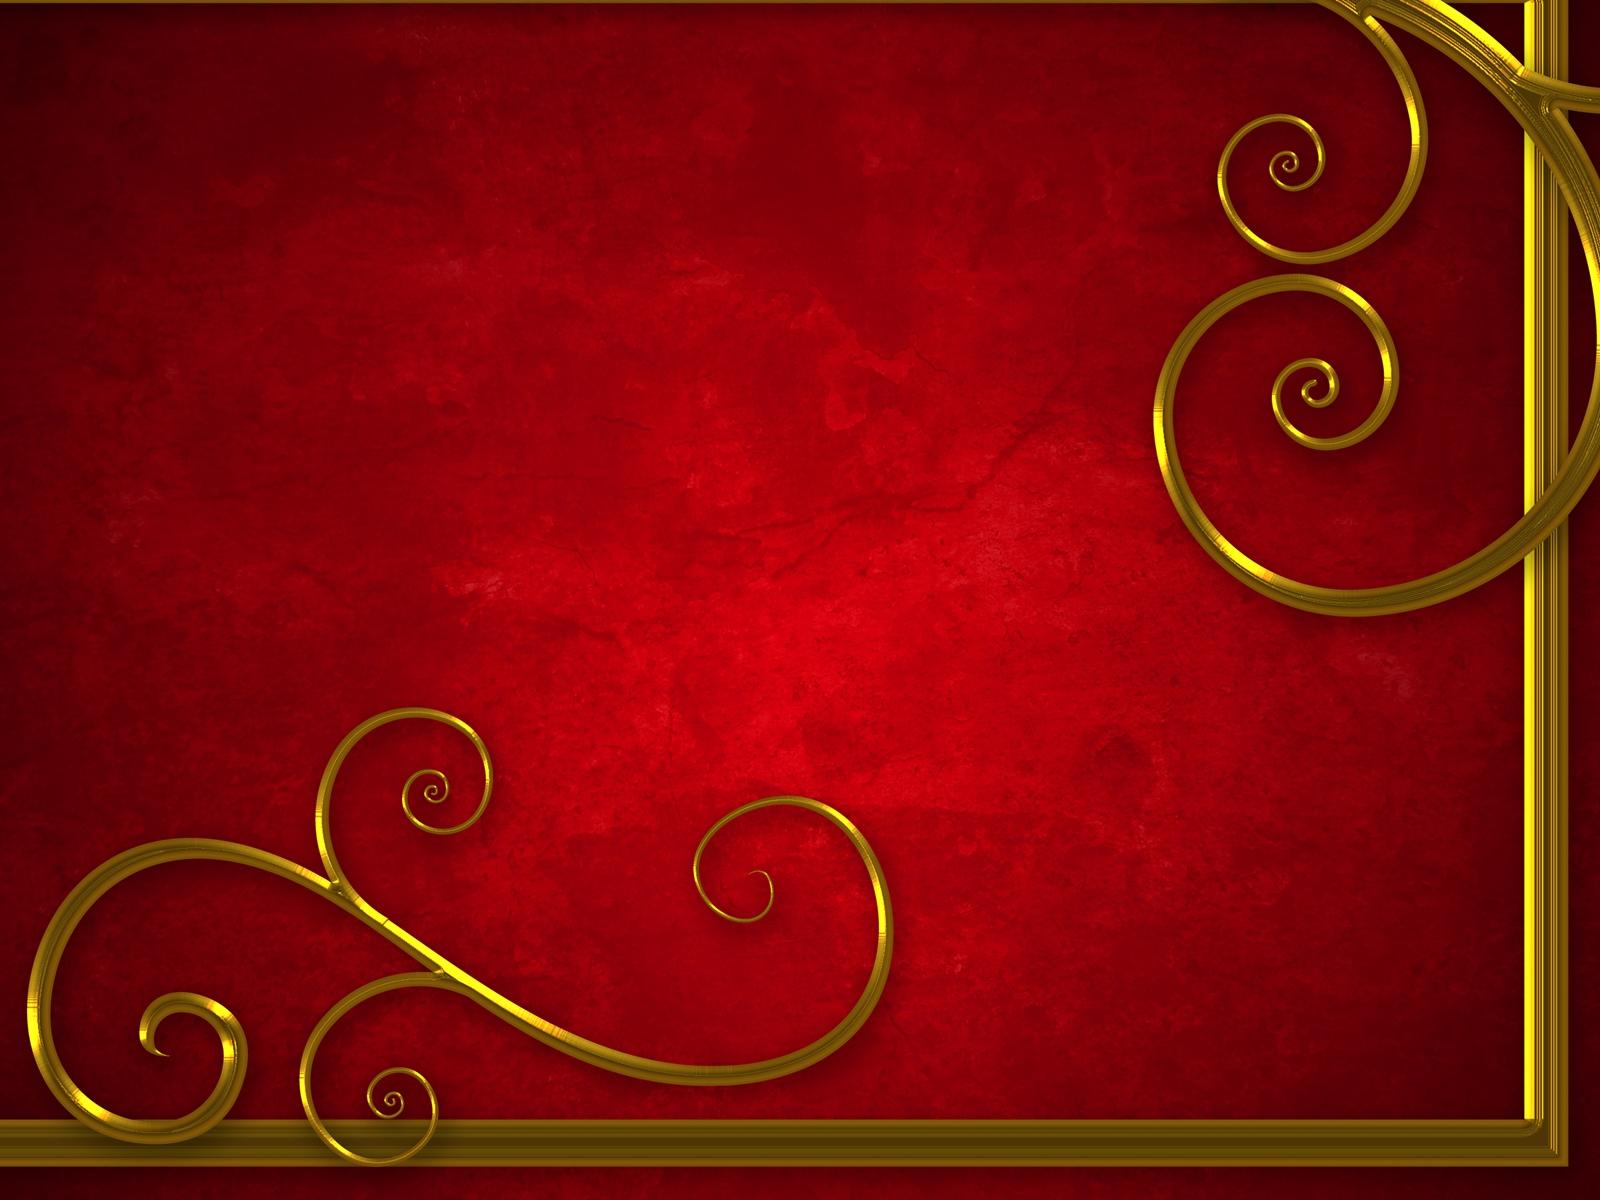 Royal Blue and Gold Wallpaper - WallpaperSafari